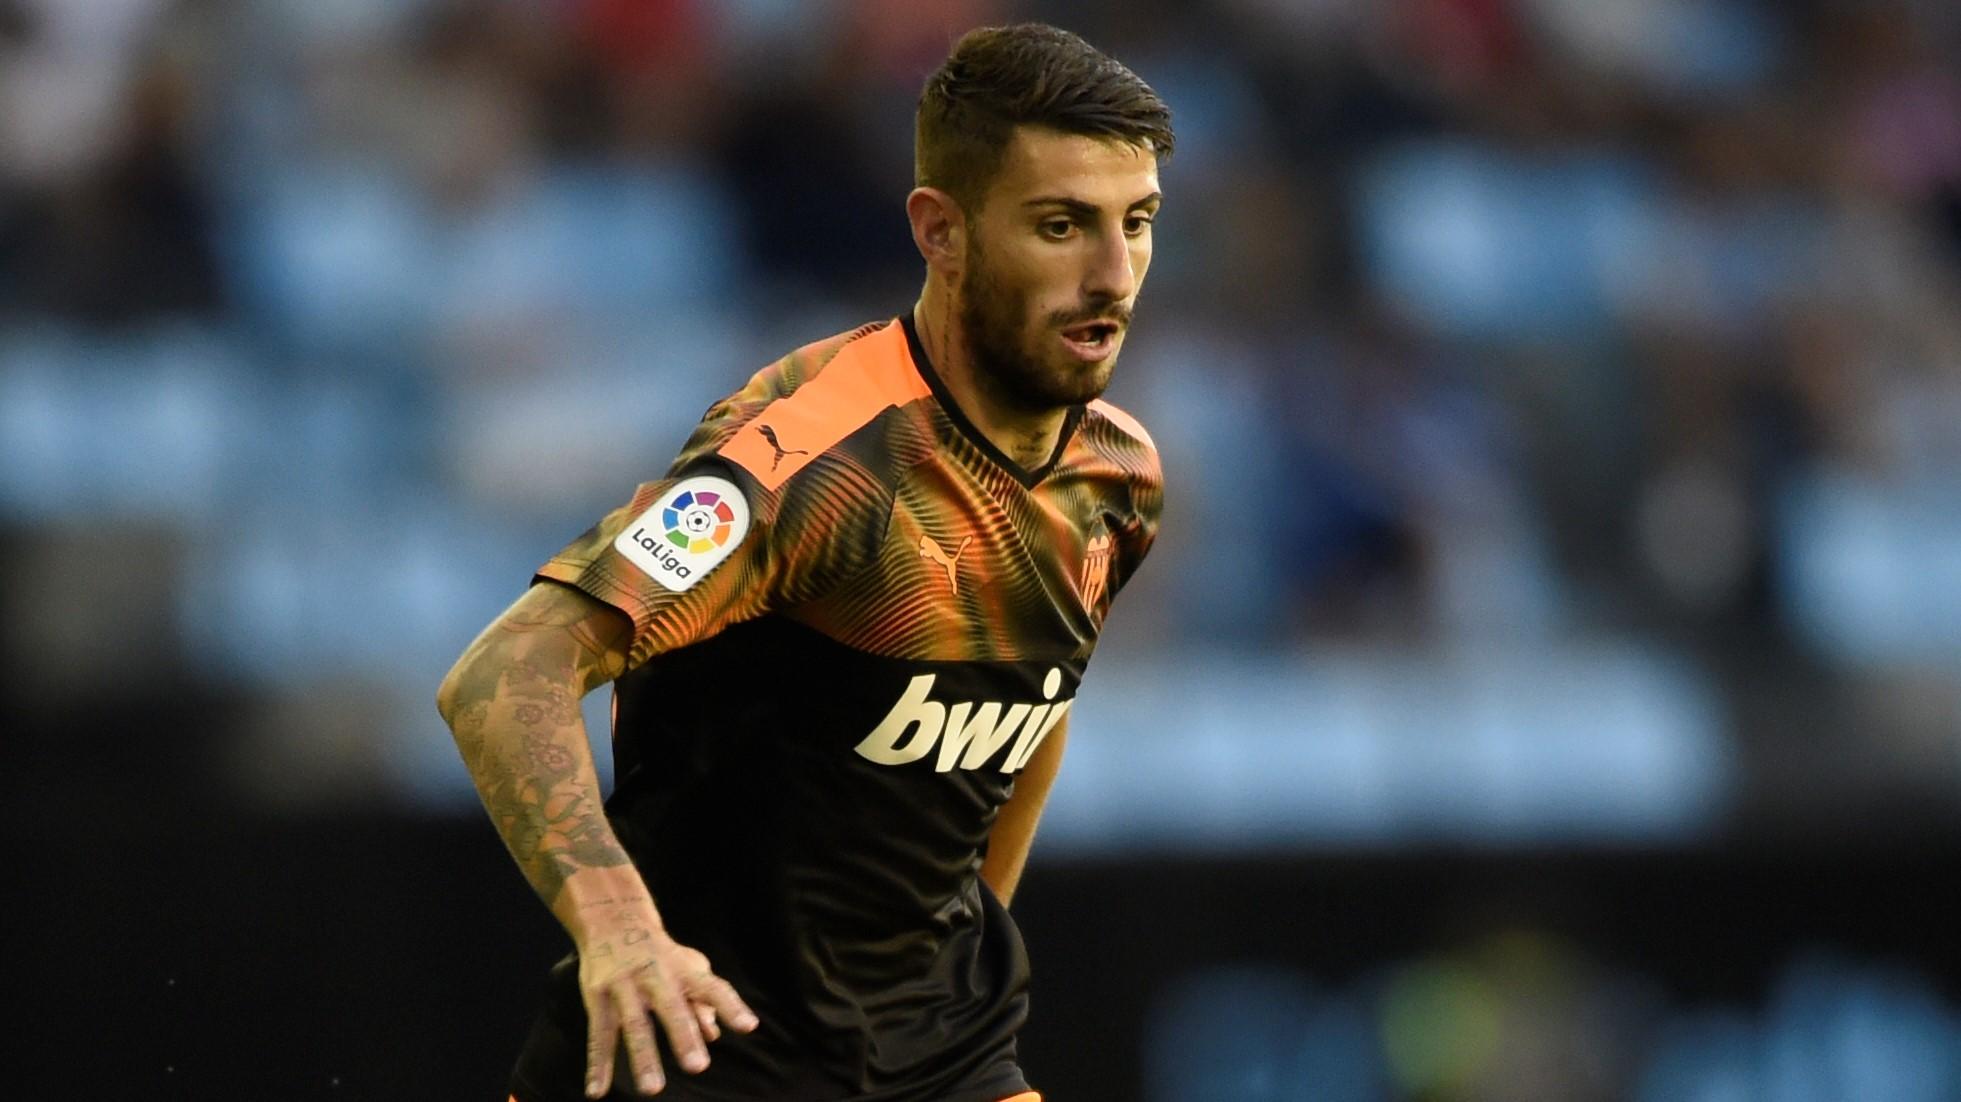 OFFICIEL - Cristiano Piccini quitte Valence et rejoint l'Atalanta Bergame